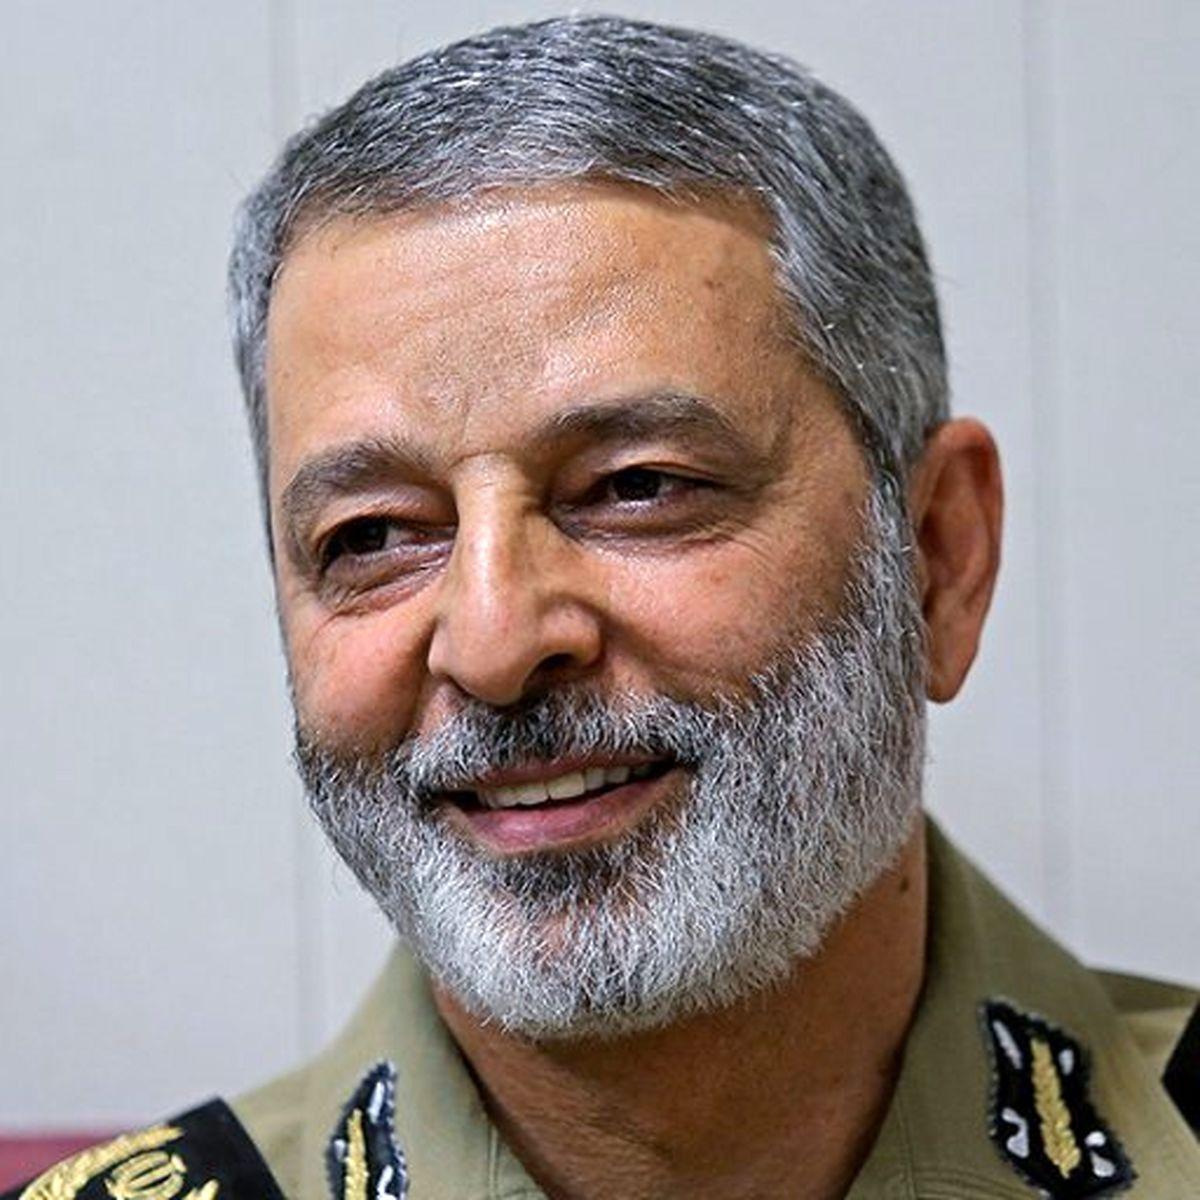 سرلشکر موسوی: امنیت را به صورت کامل احساس میکنیم